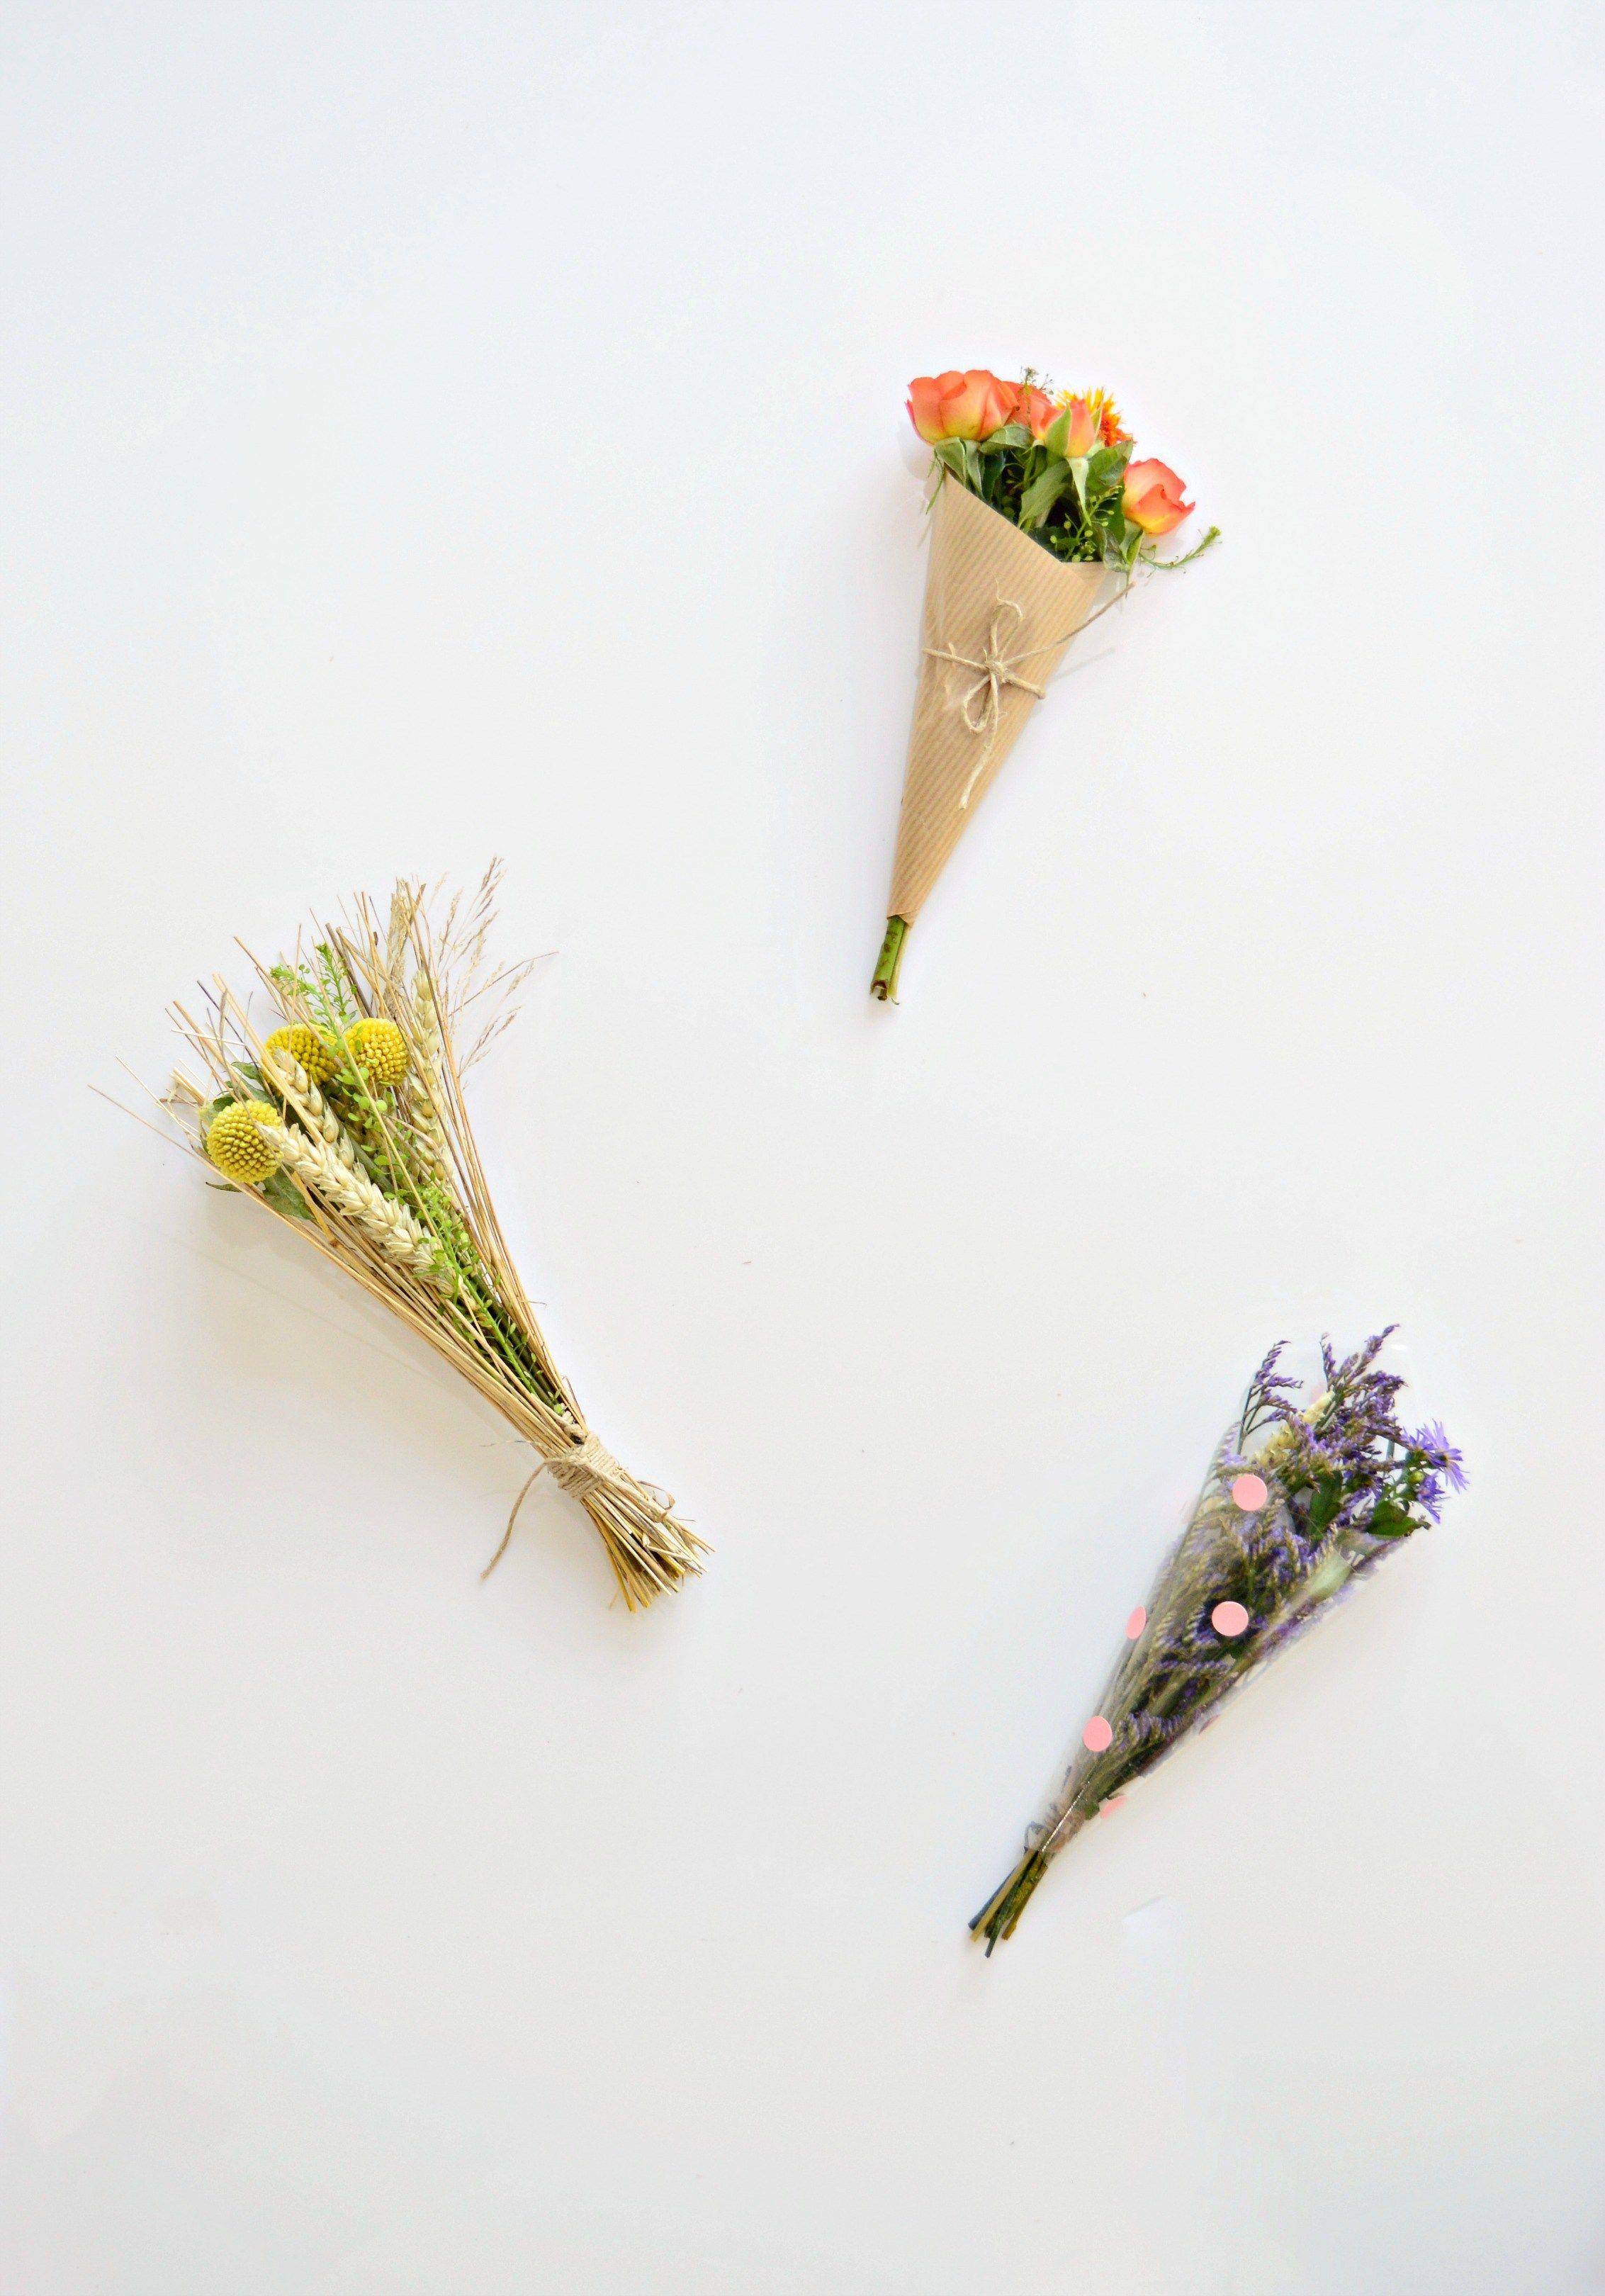 How to wrap a mini bouquet of flowers flowers pinterest wraps how to wrap a mini bouquet of flowers izmirmasajfo